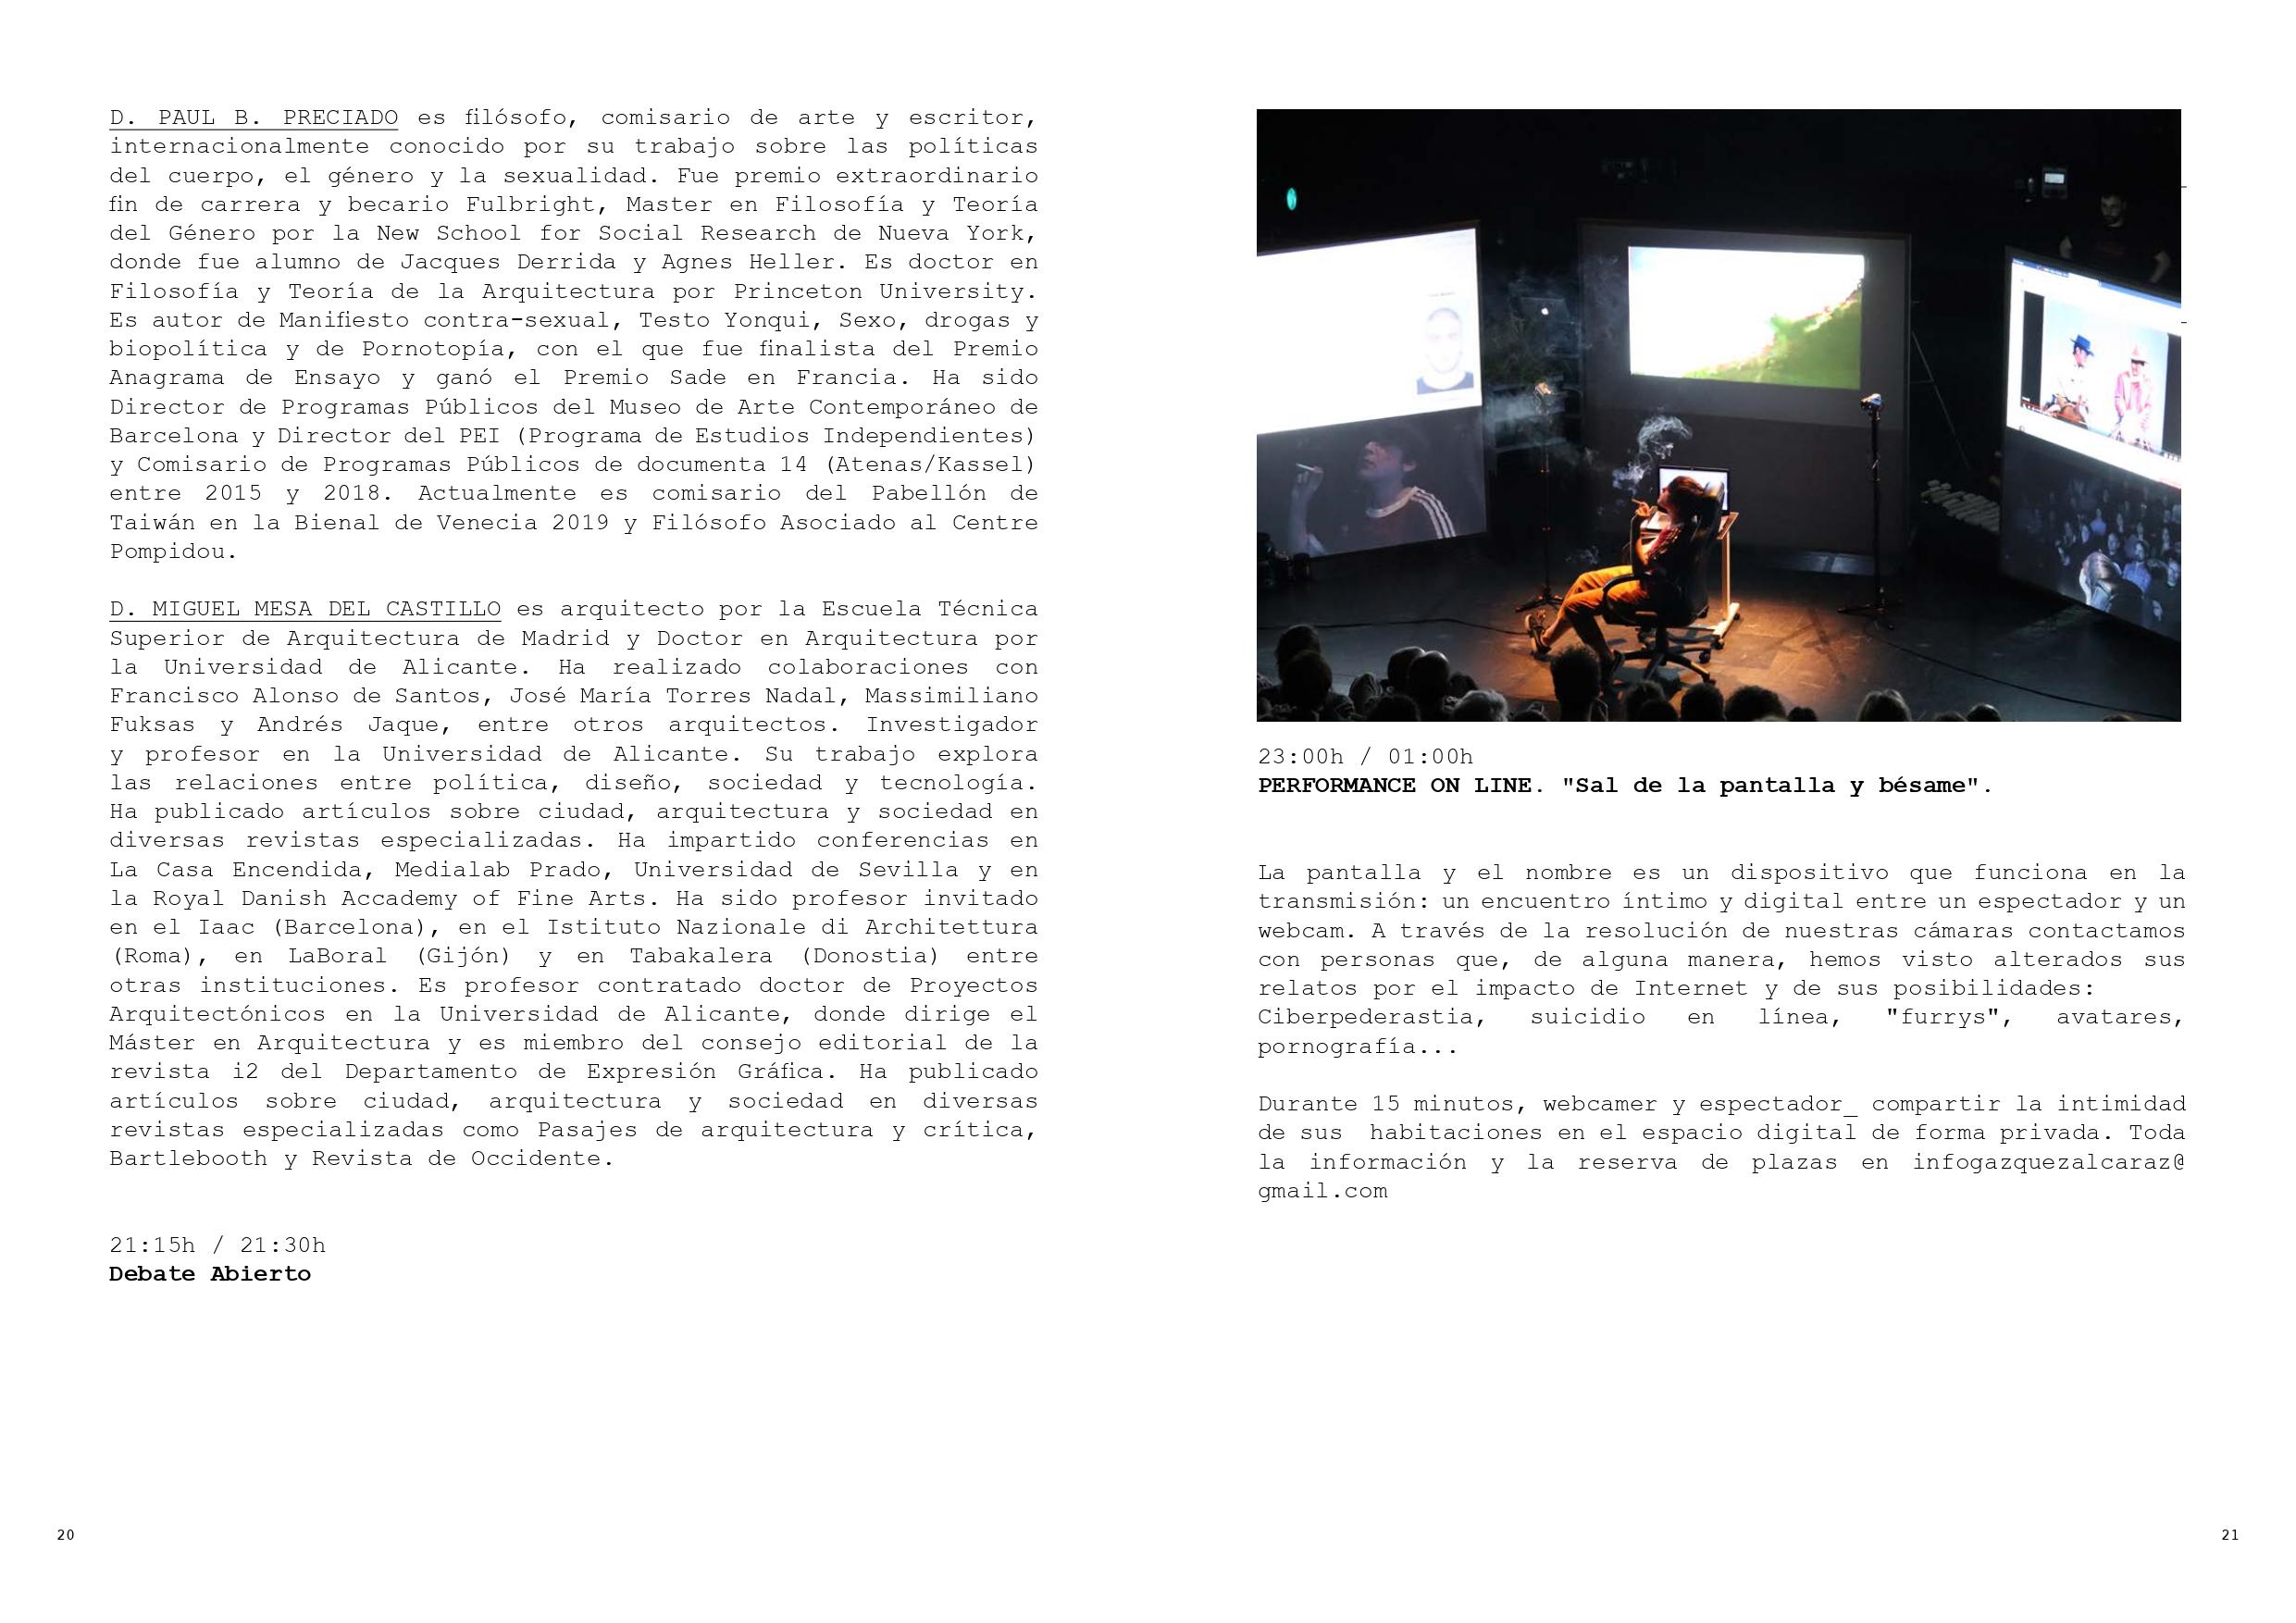 Programa-congreso-I_page-0011.jpg